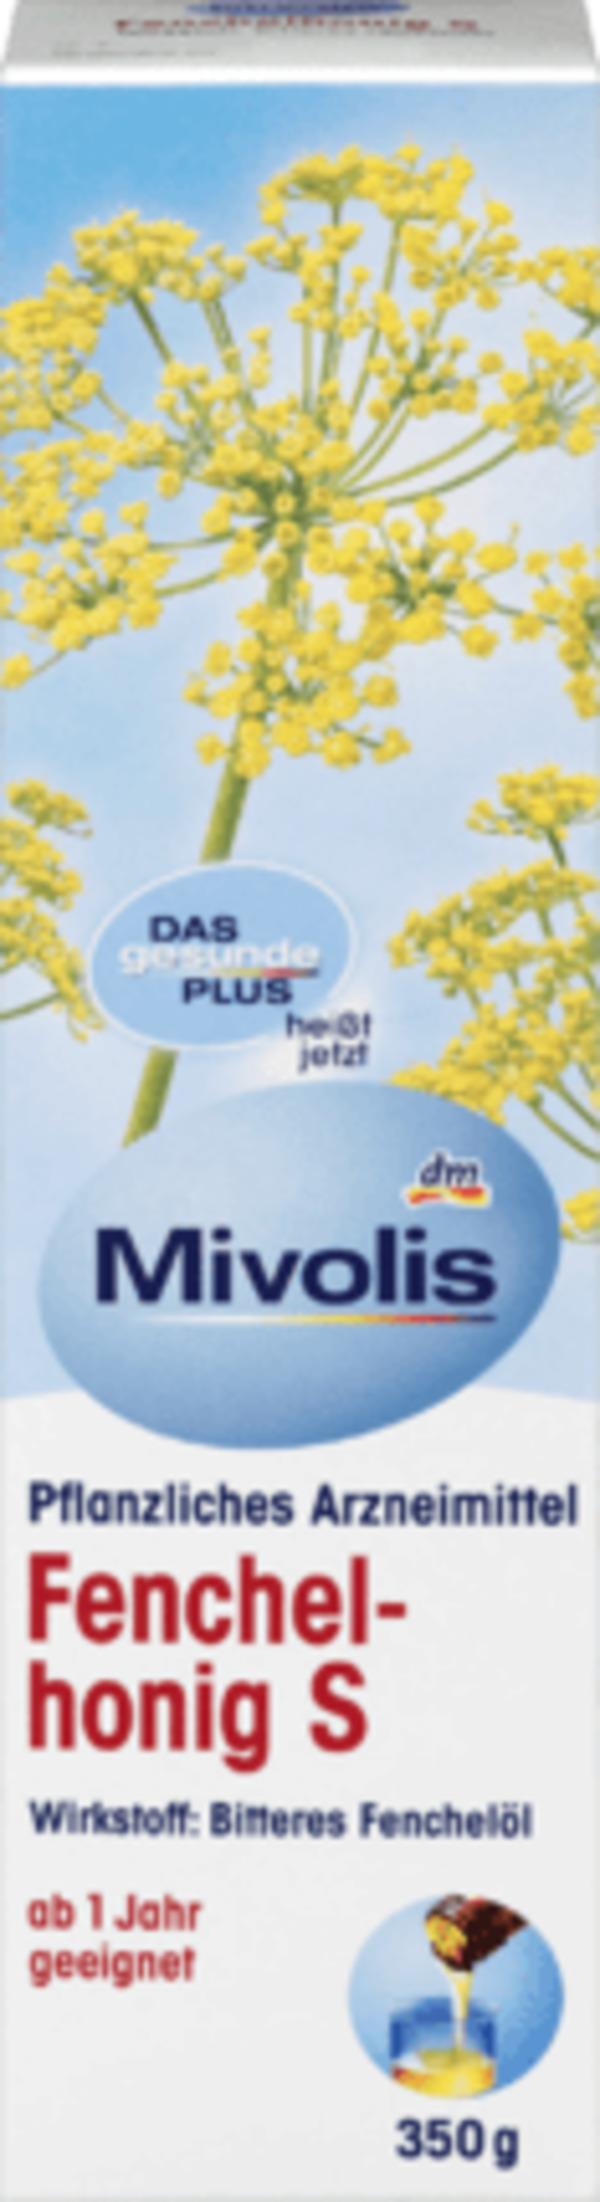 Mivolis Fenchelhonig S